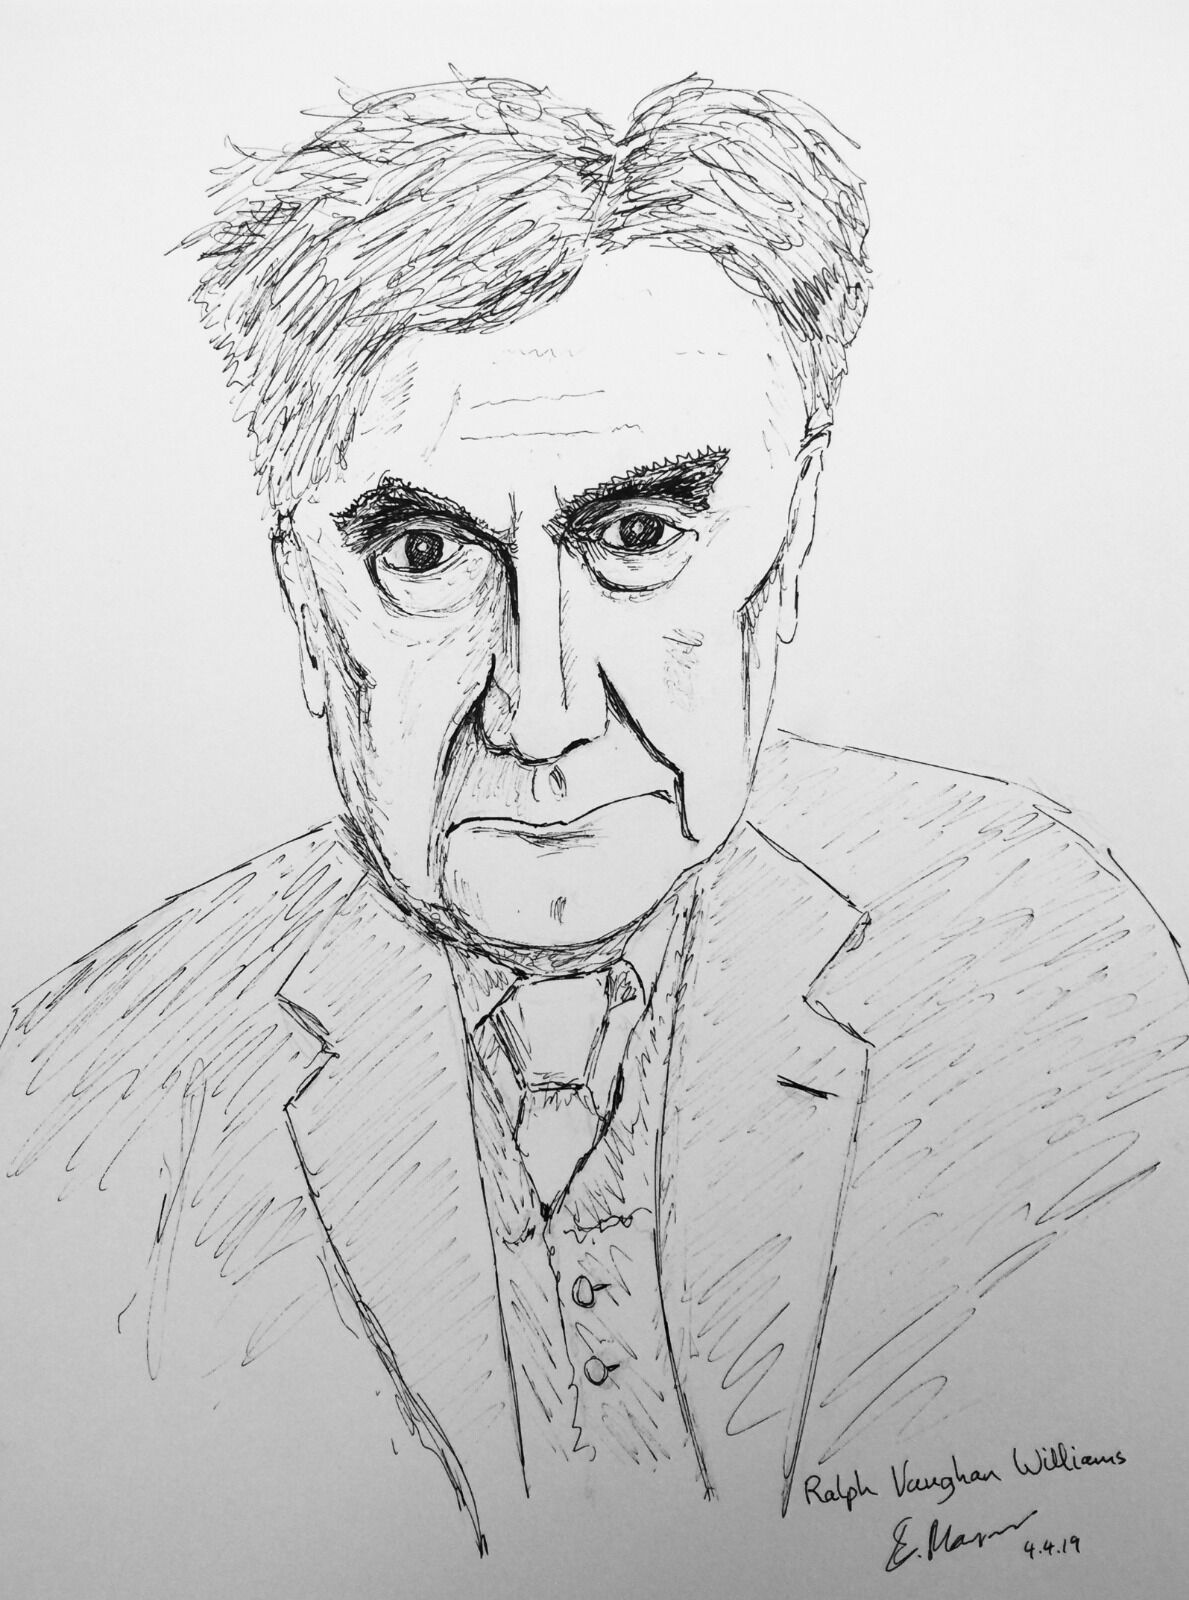 Ralf Vaughan Williams